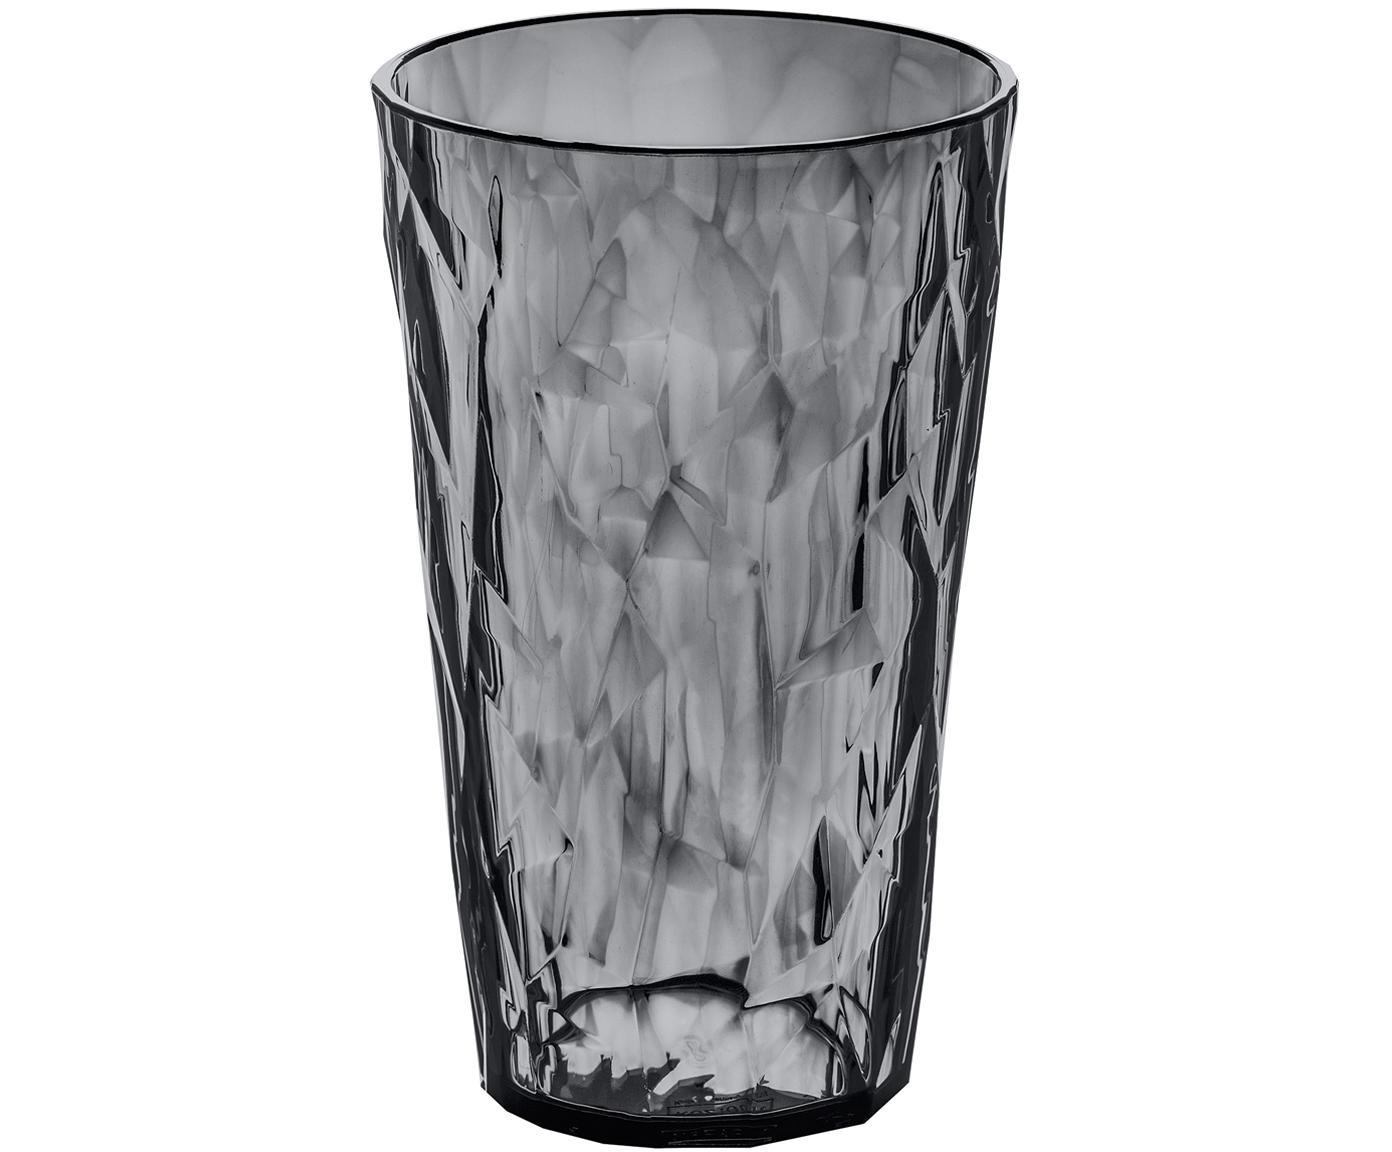 Bicchieri in materiale sintetico Club, 6 pz., Materiale sintetico SAN senza BPA, Grigio trasparente, Ø 9 x A 14 cm